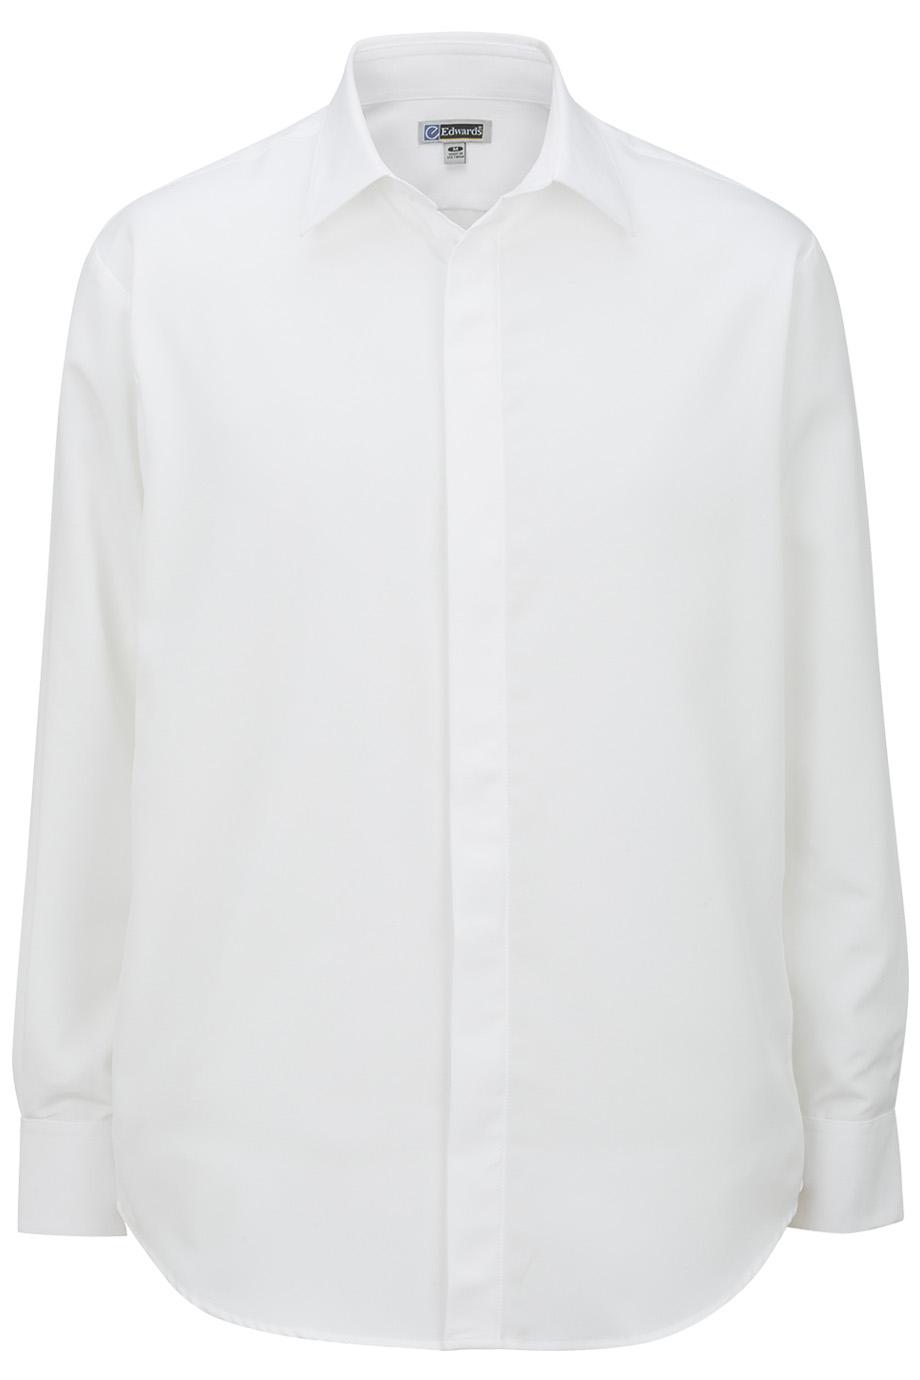 1291 Batiste Fly Shirt-Edwards